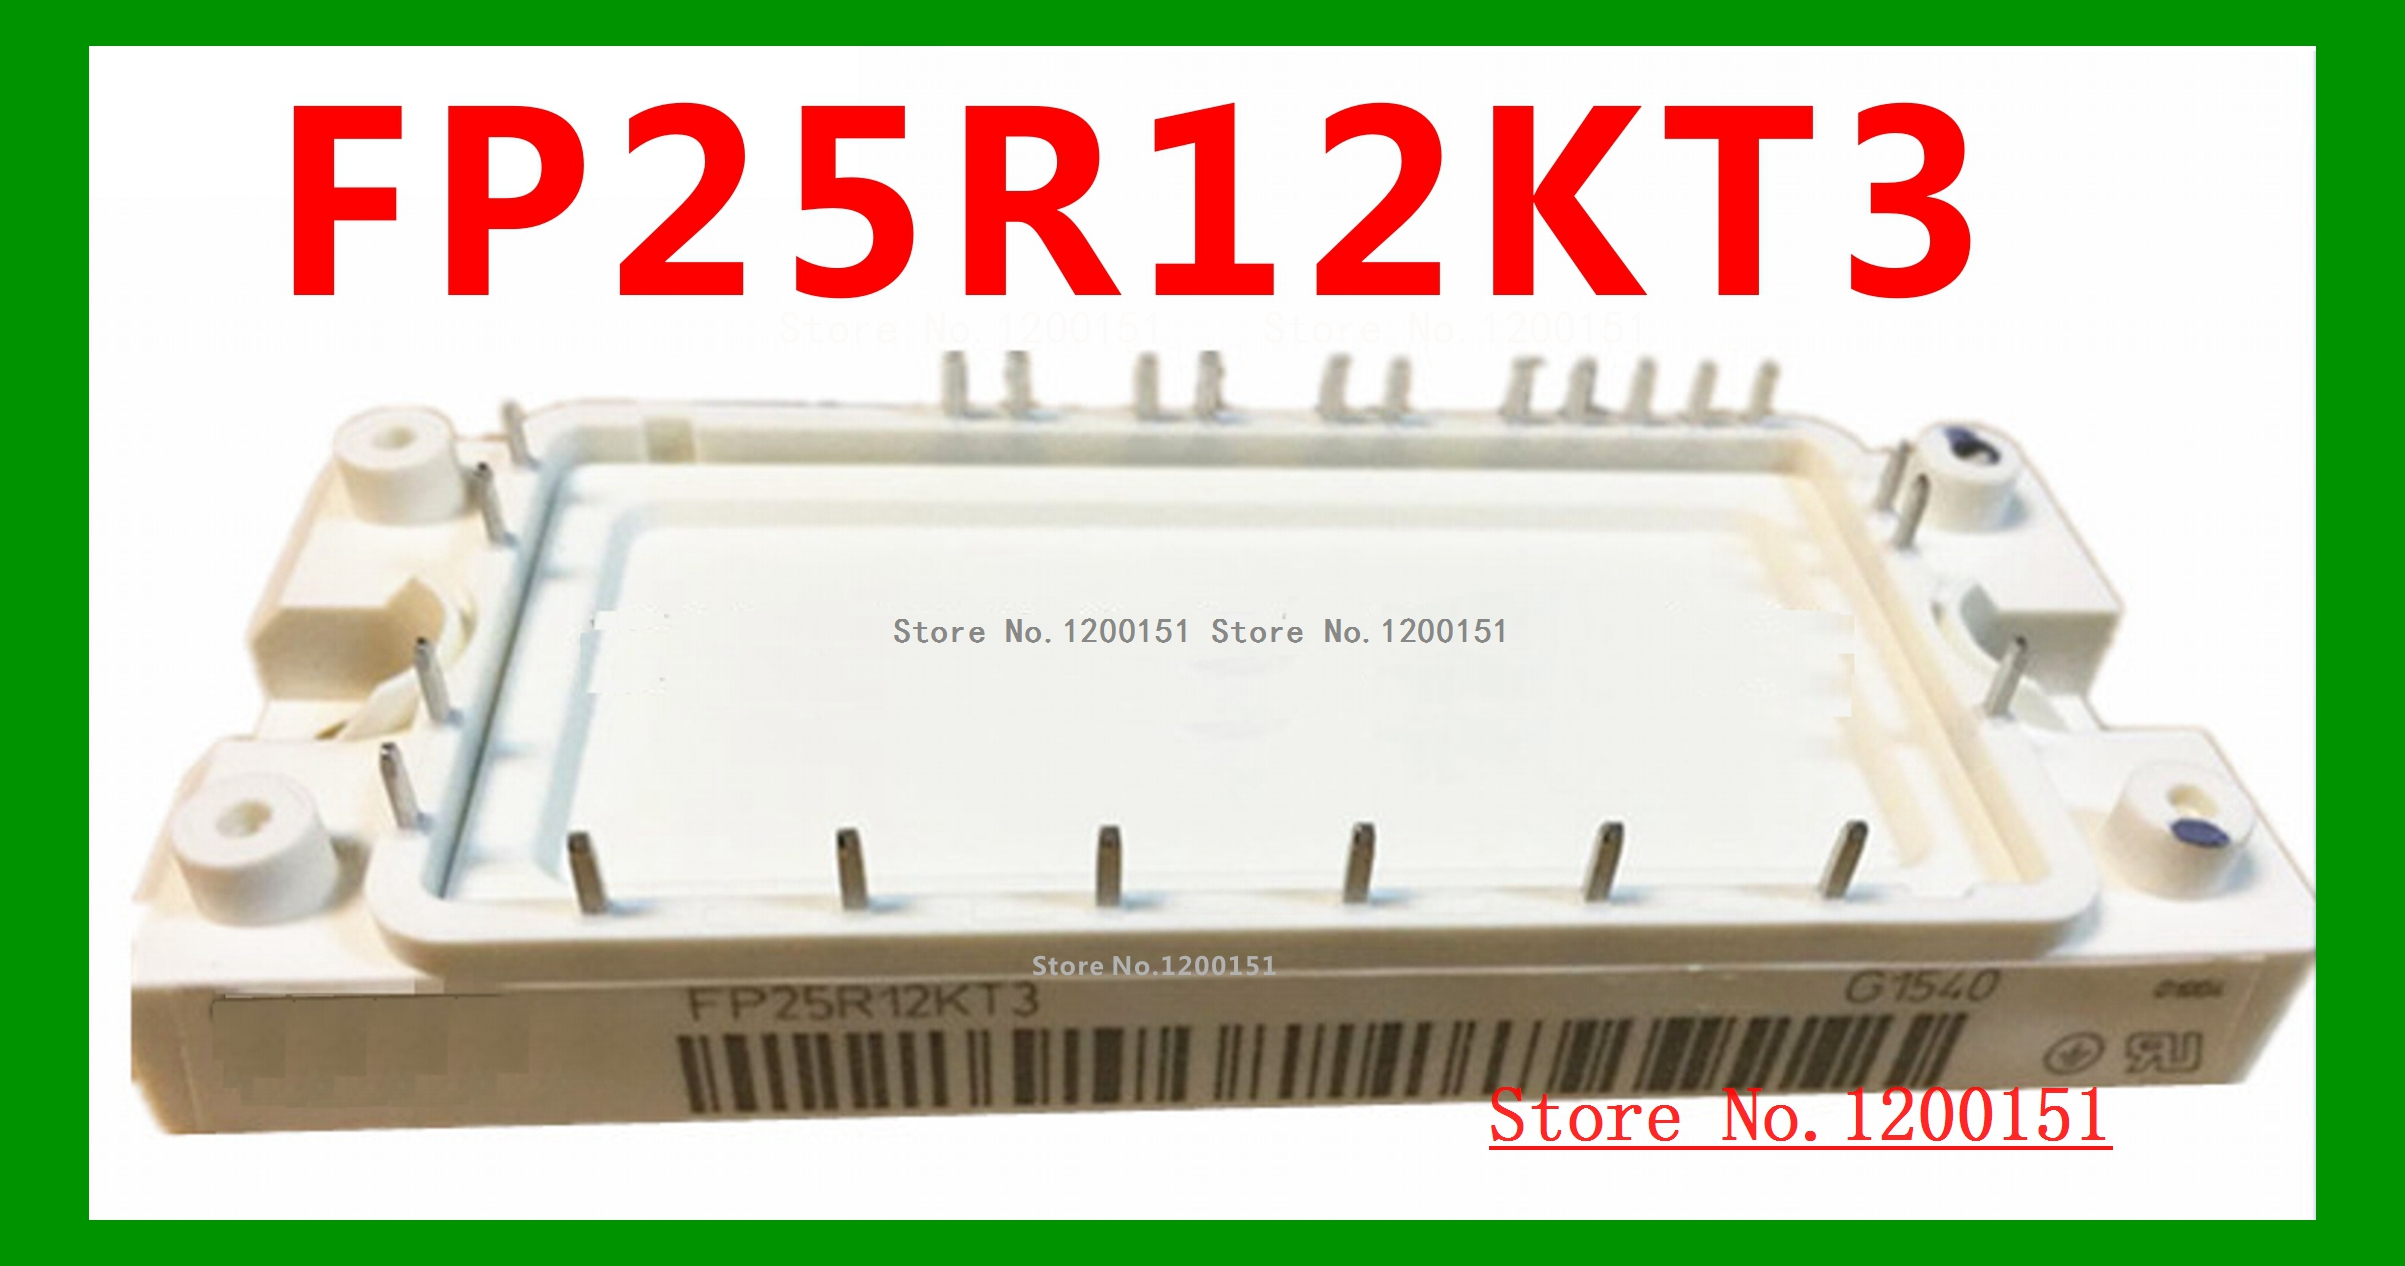 FP25R12KT3 FP25R12KT4 FP35R12KT4 FP50R12KT4 MODULESFP25R12KT3 FP25R12KT4 FP35R12KT4 FP50R12KT4 MODULES